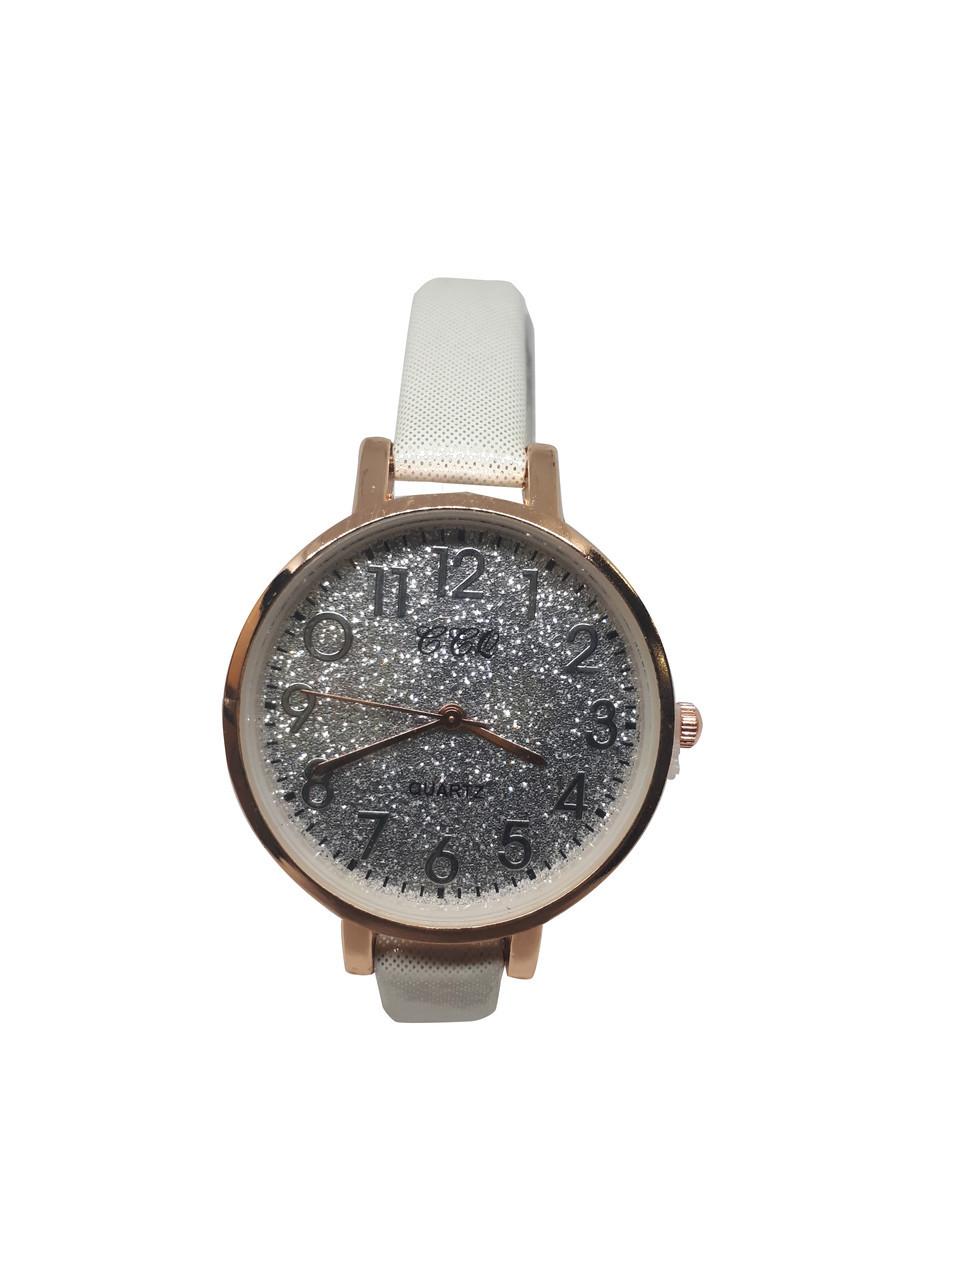 Часы женские кварцевые CCQ Блестки  опт